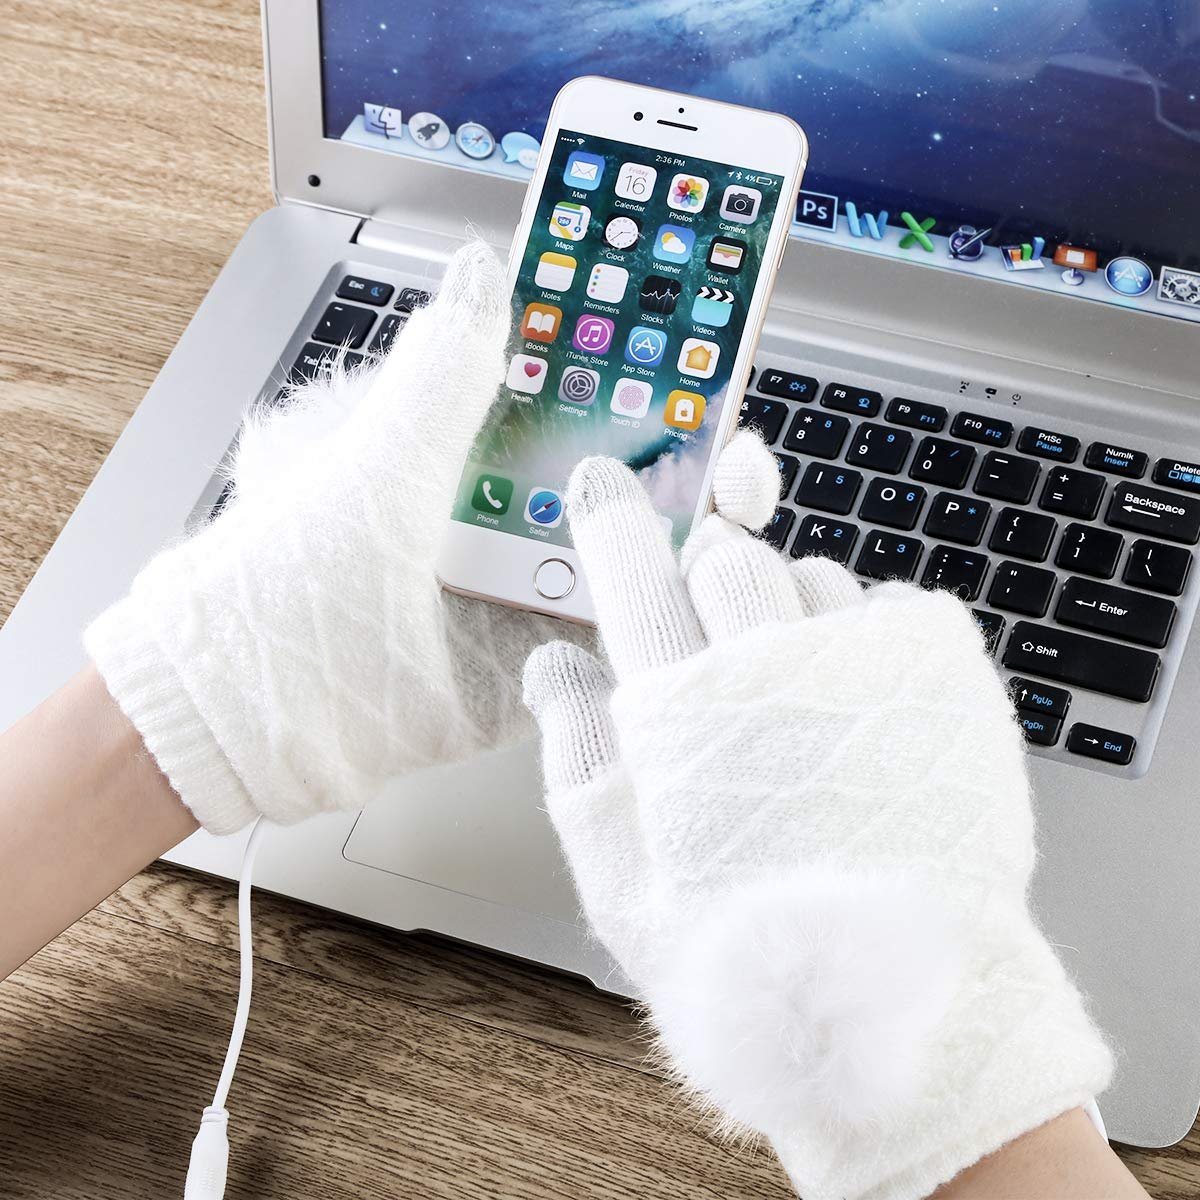 Guanti Mezze Dita Intere Mengqiy Guanti scaldamani USB Caldi Invernali Unisex per Uomo e Donna riscaldati Via USB